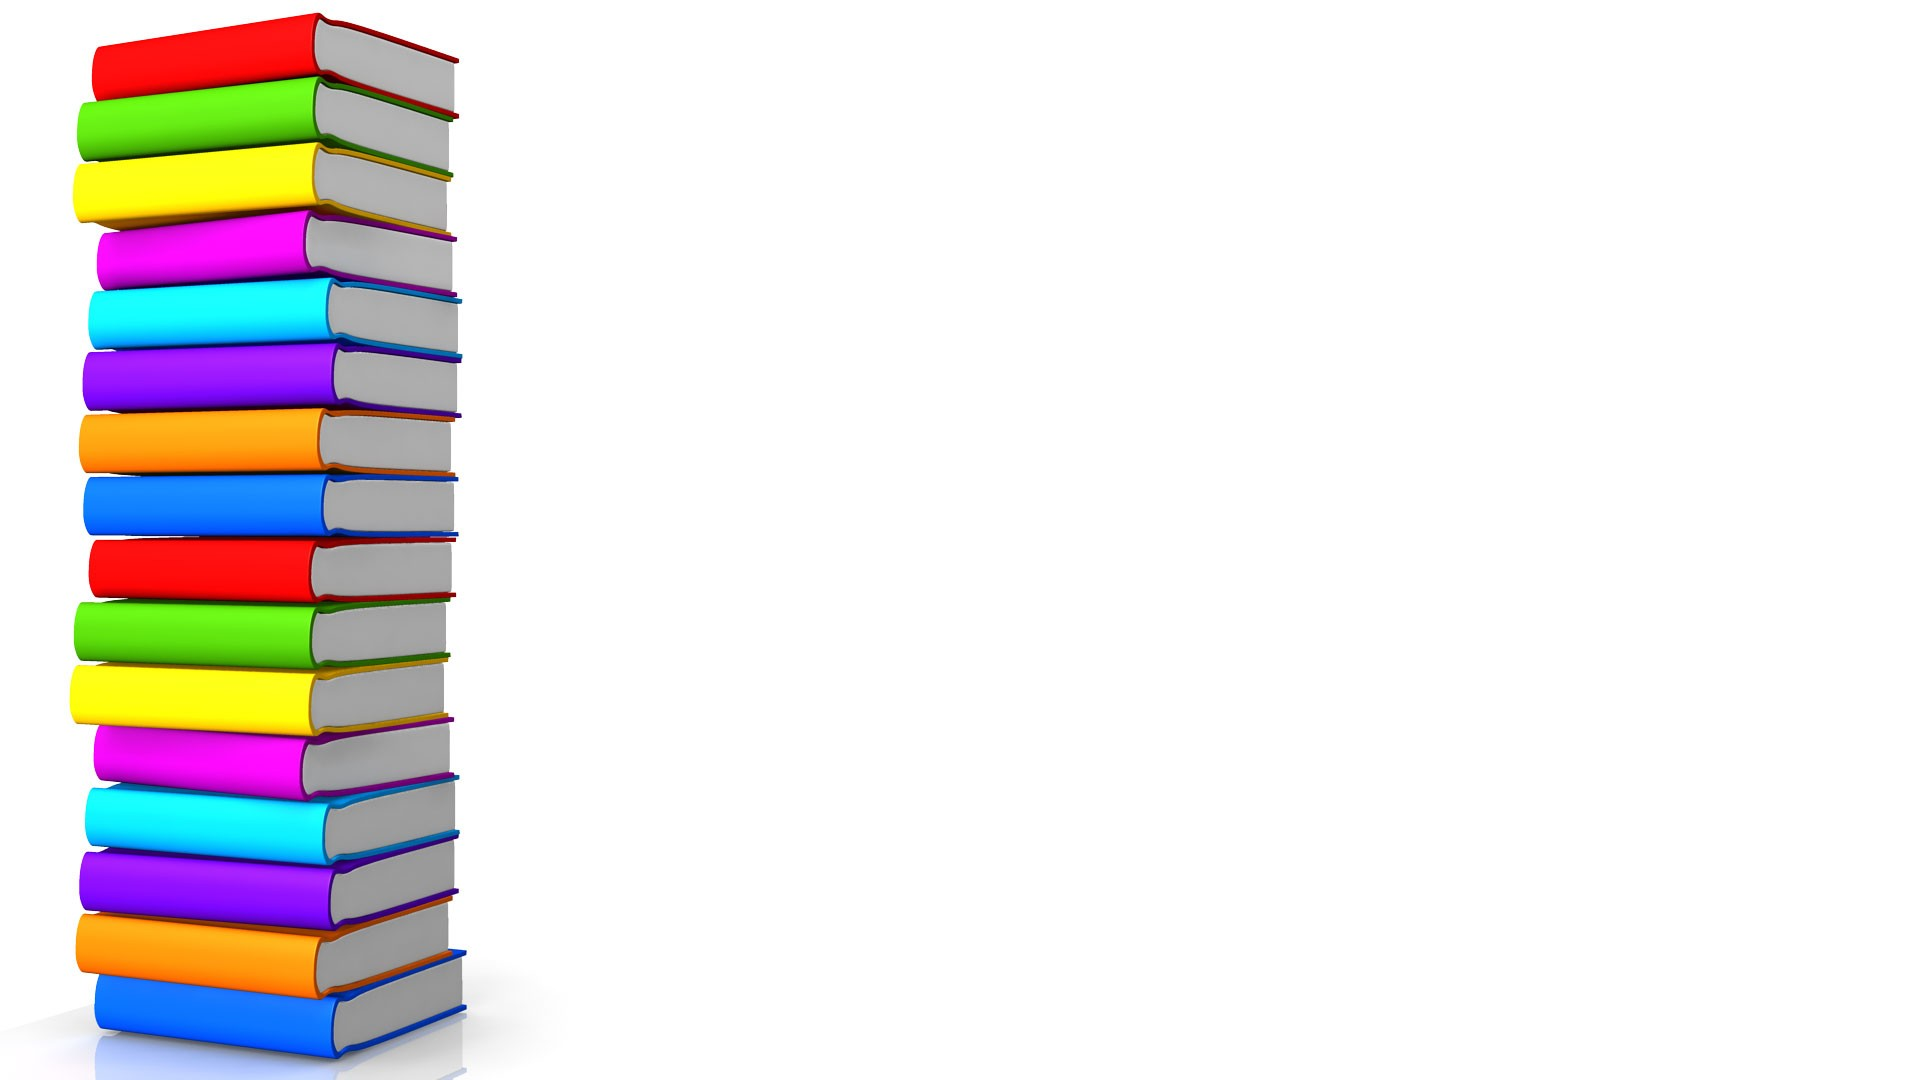 Book Border Clipart - .-Book Border Clipart - .-8